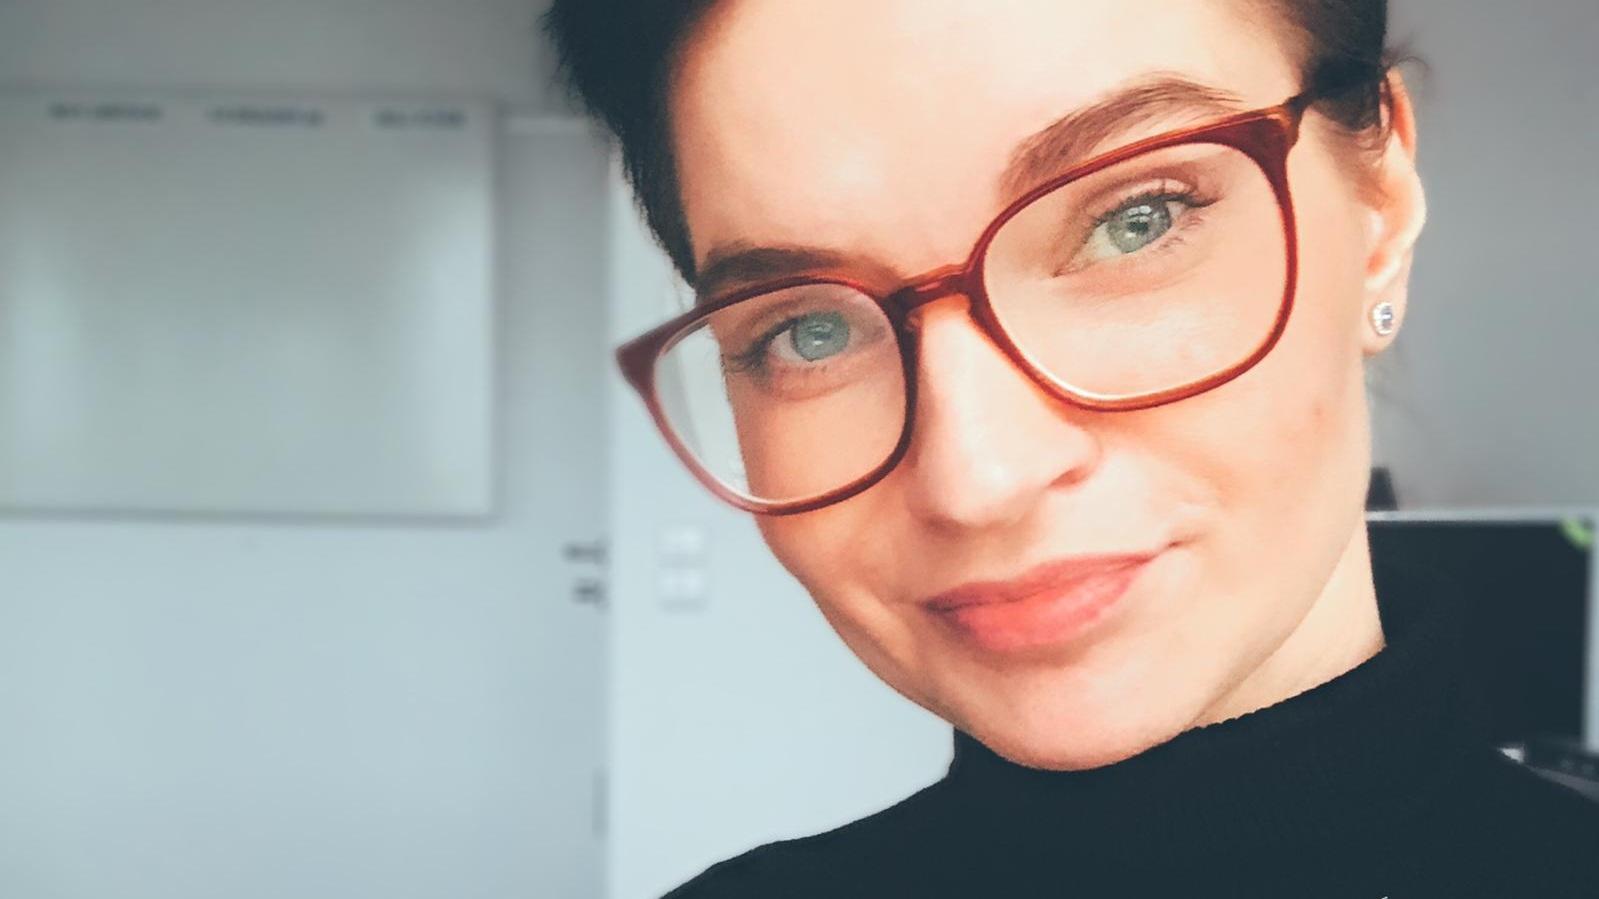 Alexandra A. Schulz - Cognitive Psychologist, Digital Poetrist & Artist